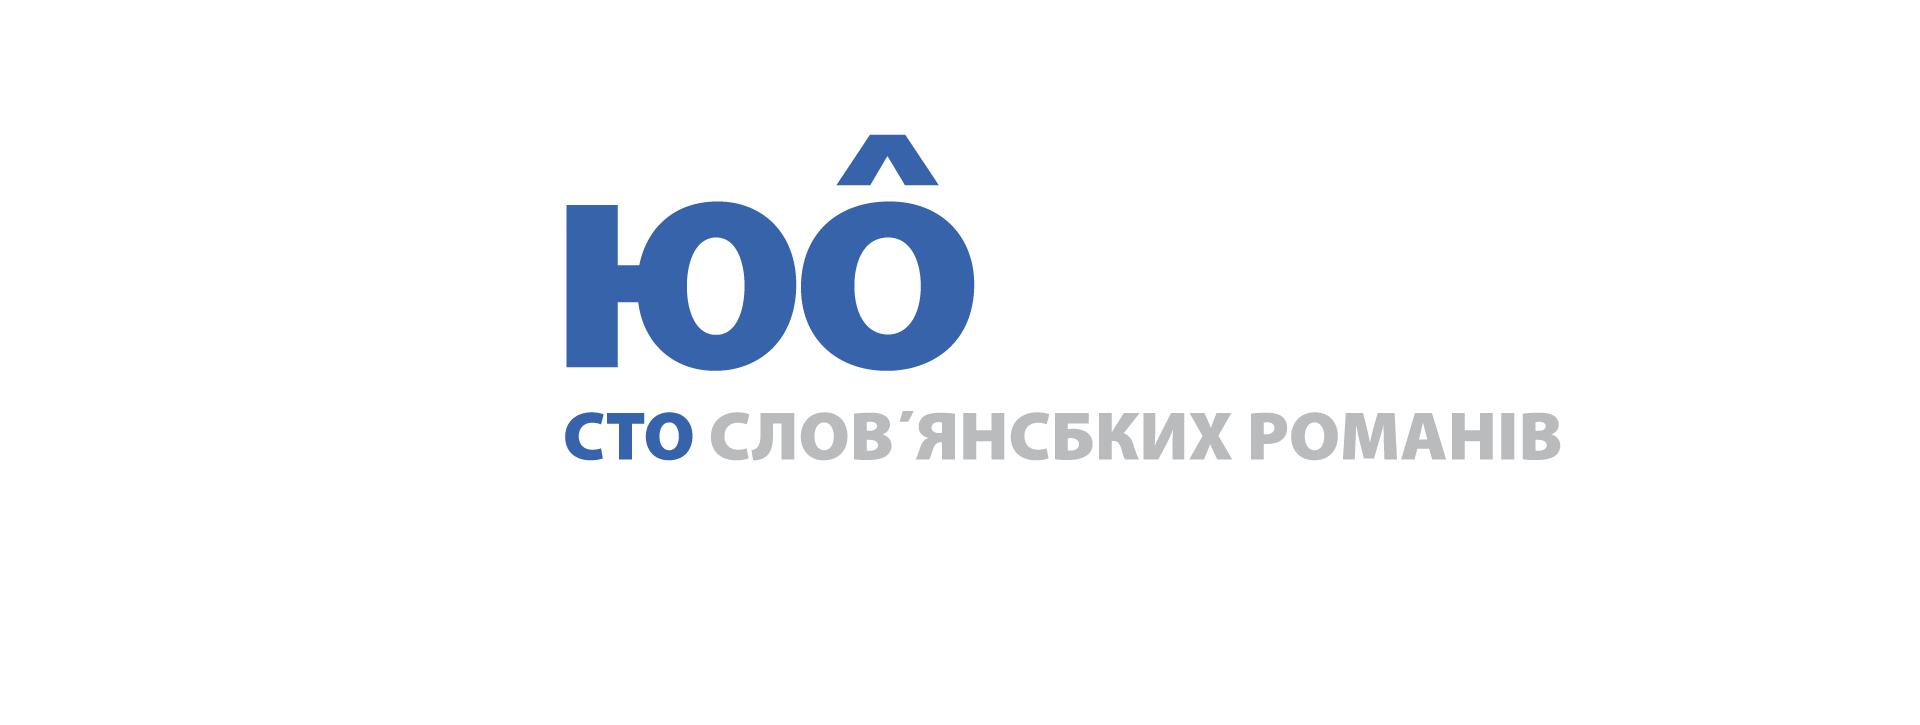 100 romanov_arnoldvuga-natasa-vuga-2007-01